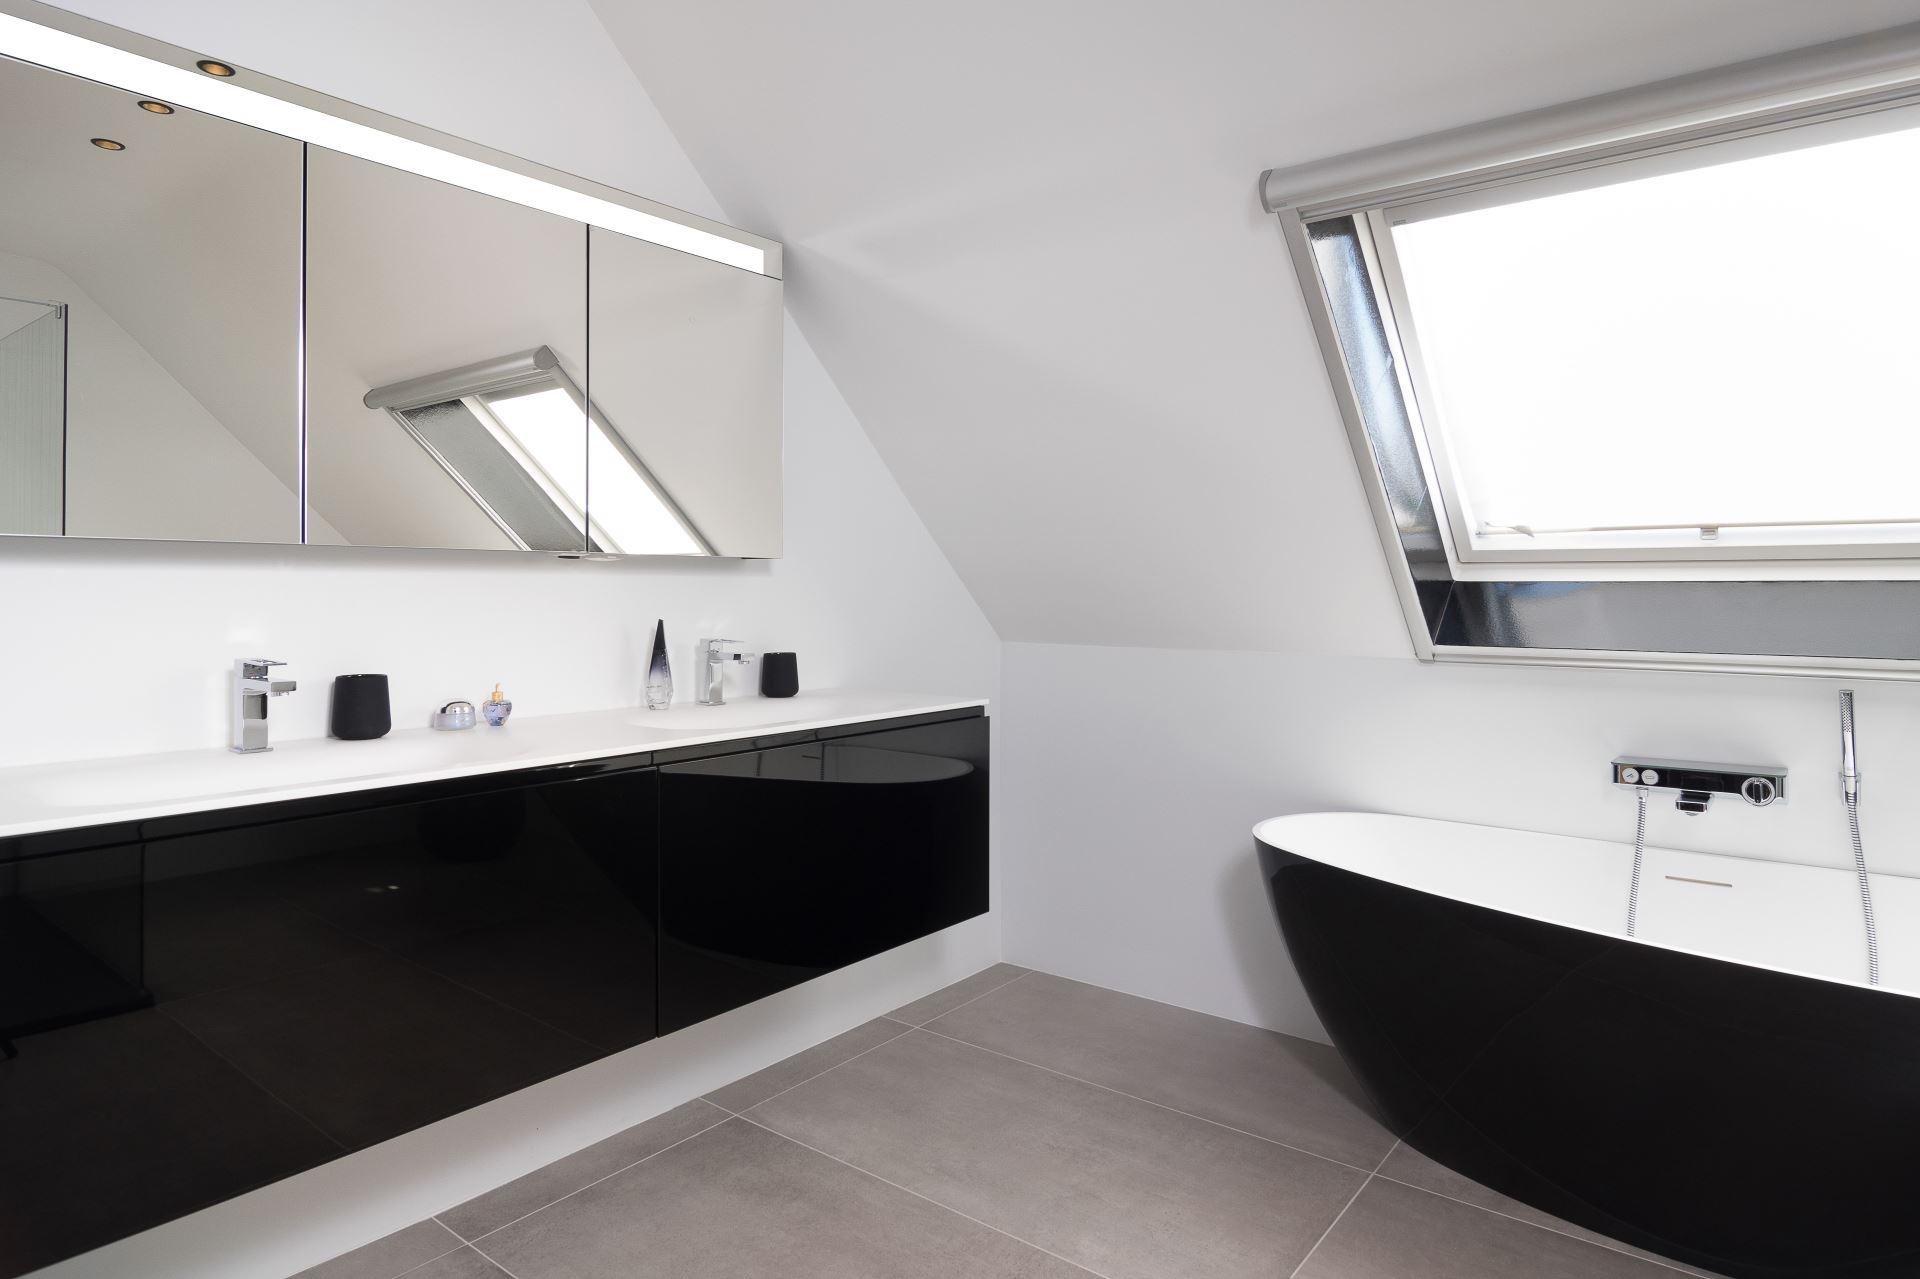 Badkamer Sanitair Brugge : Bubbles co dé badkamerspecialist